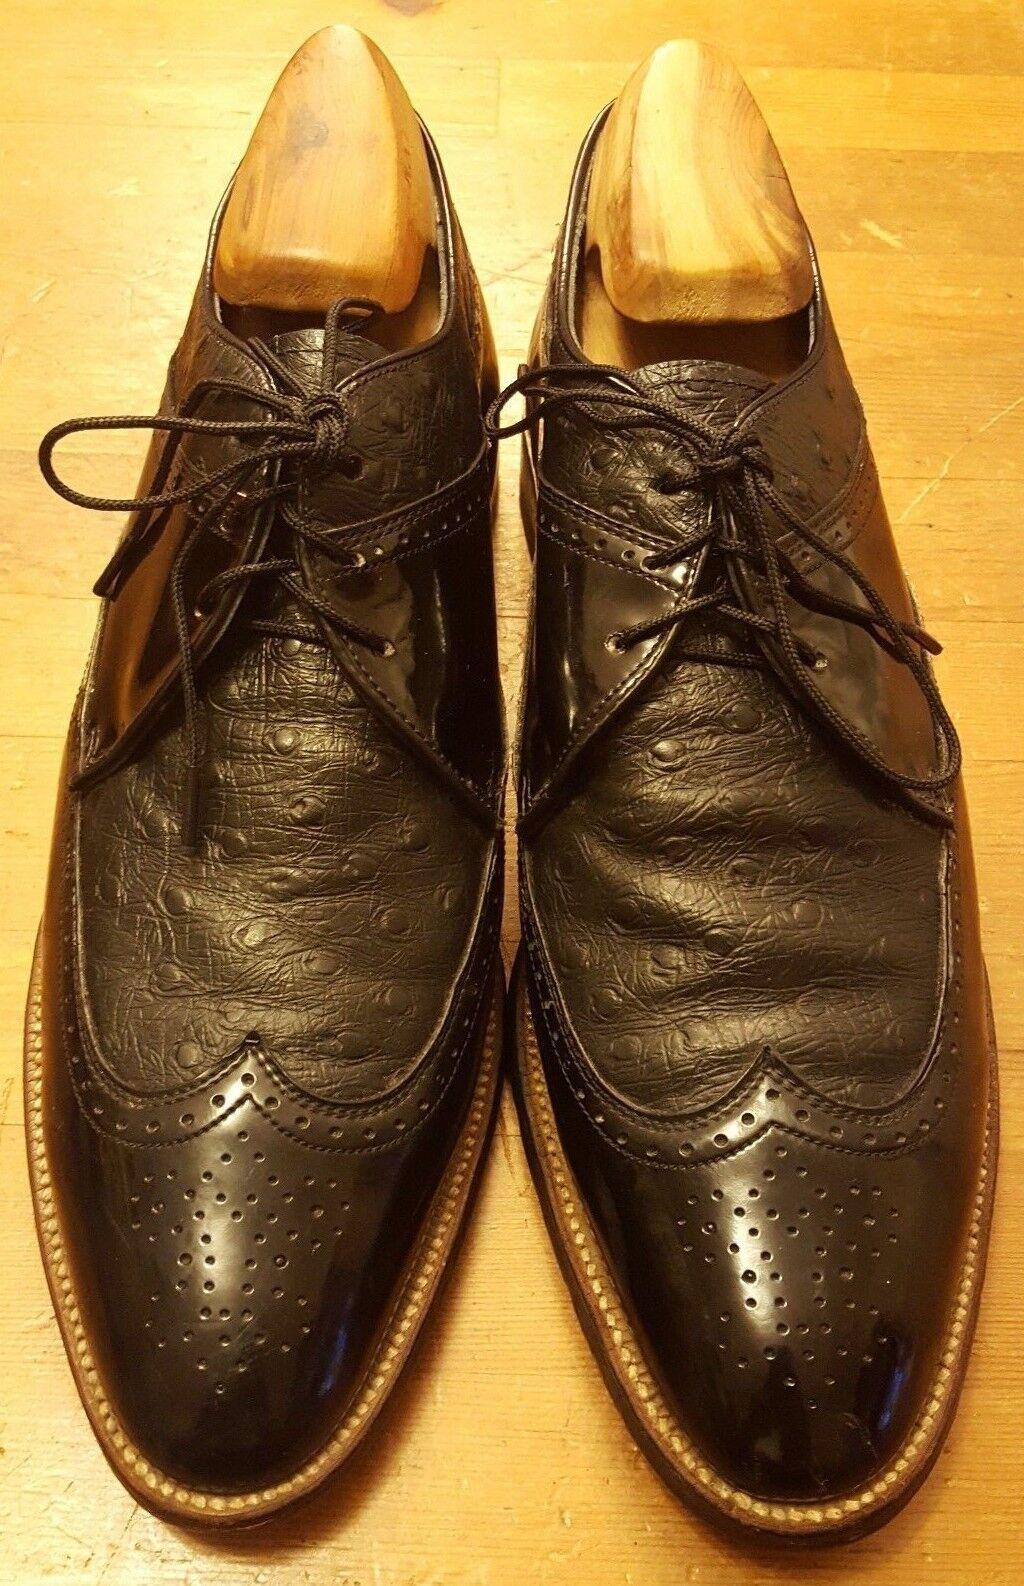 connotazione di lusso low-key Vintage, Stacy Adams, Adams, Adams, nero, Patent Leather Leather, Wing-Tips scarpe (Sz 9D)  vendita online